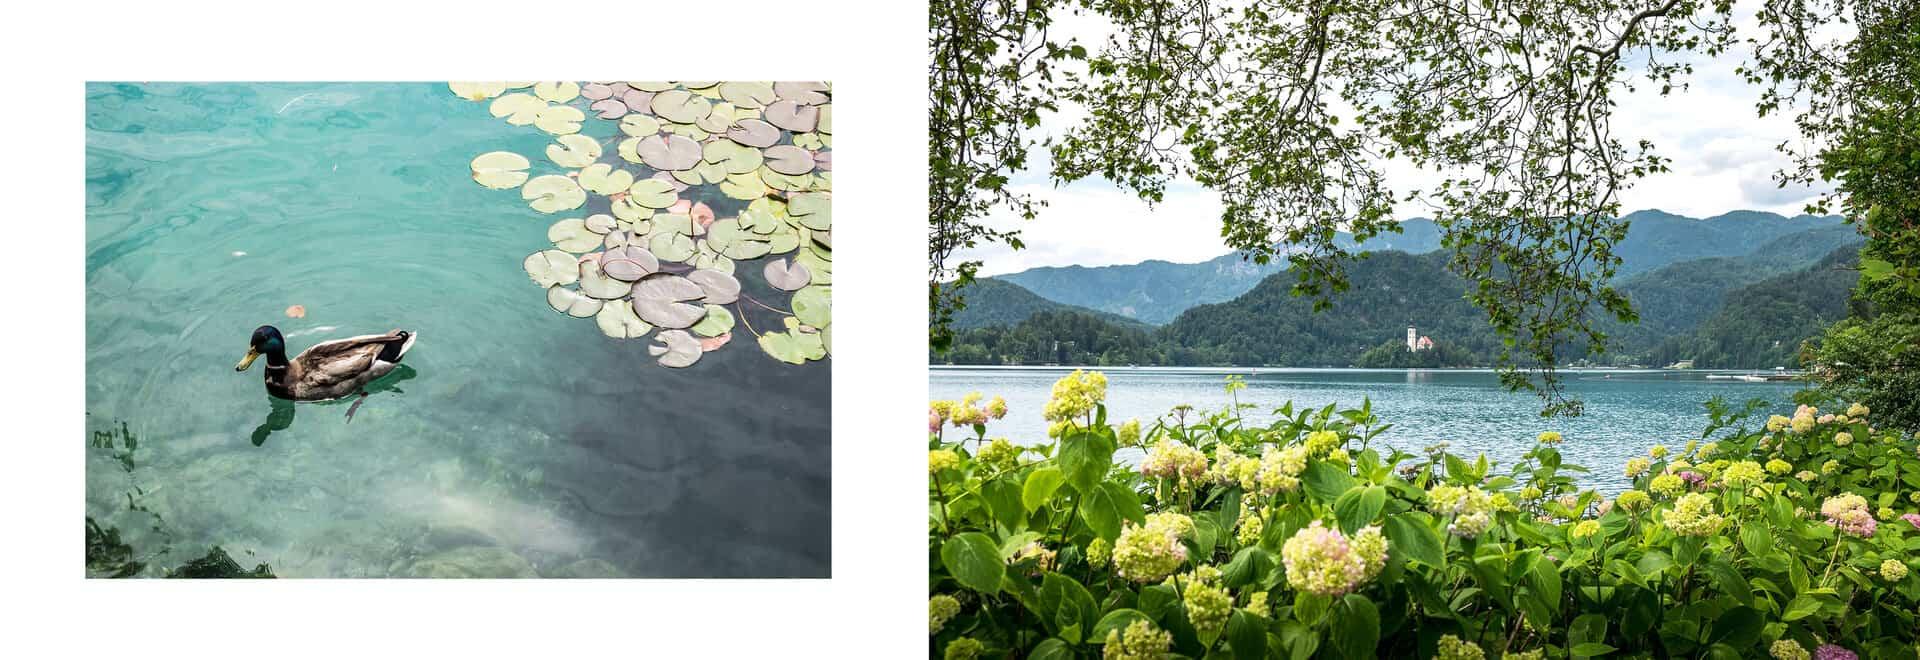 visitar lago bled